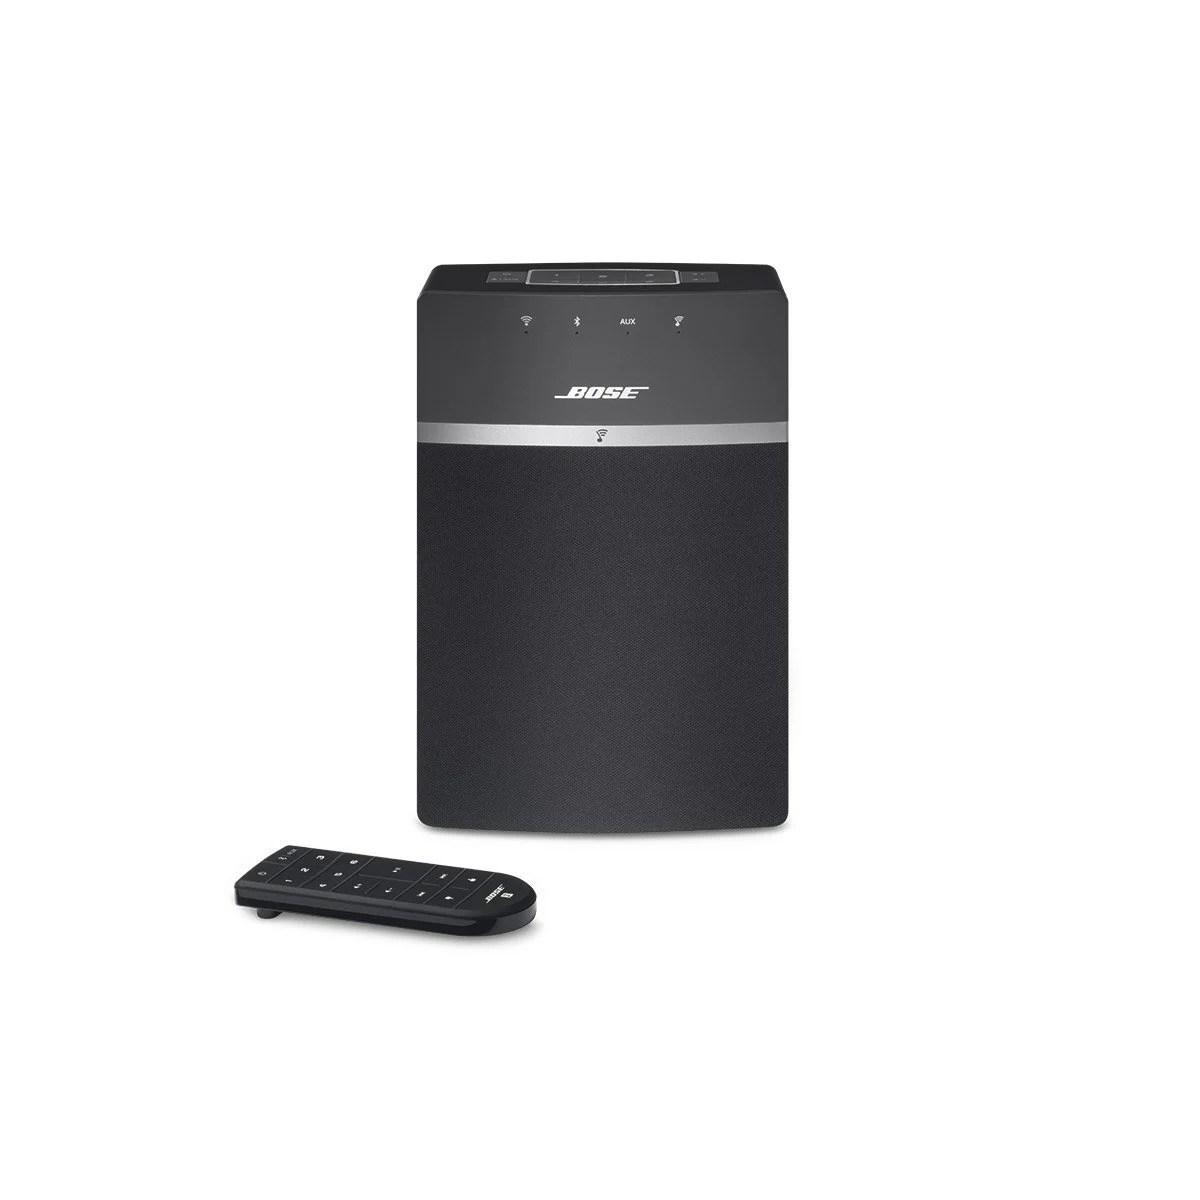 🔥 Bon plan : l'enceinte Bluetooth Bose SoundTouch 10 est à 174 euros